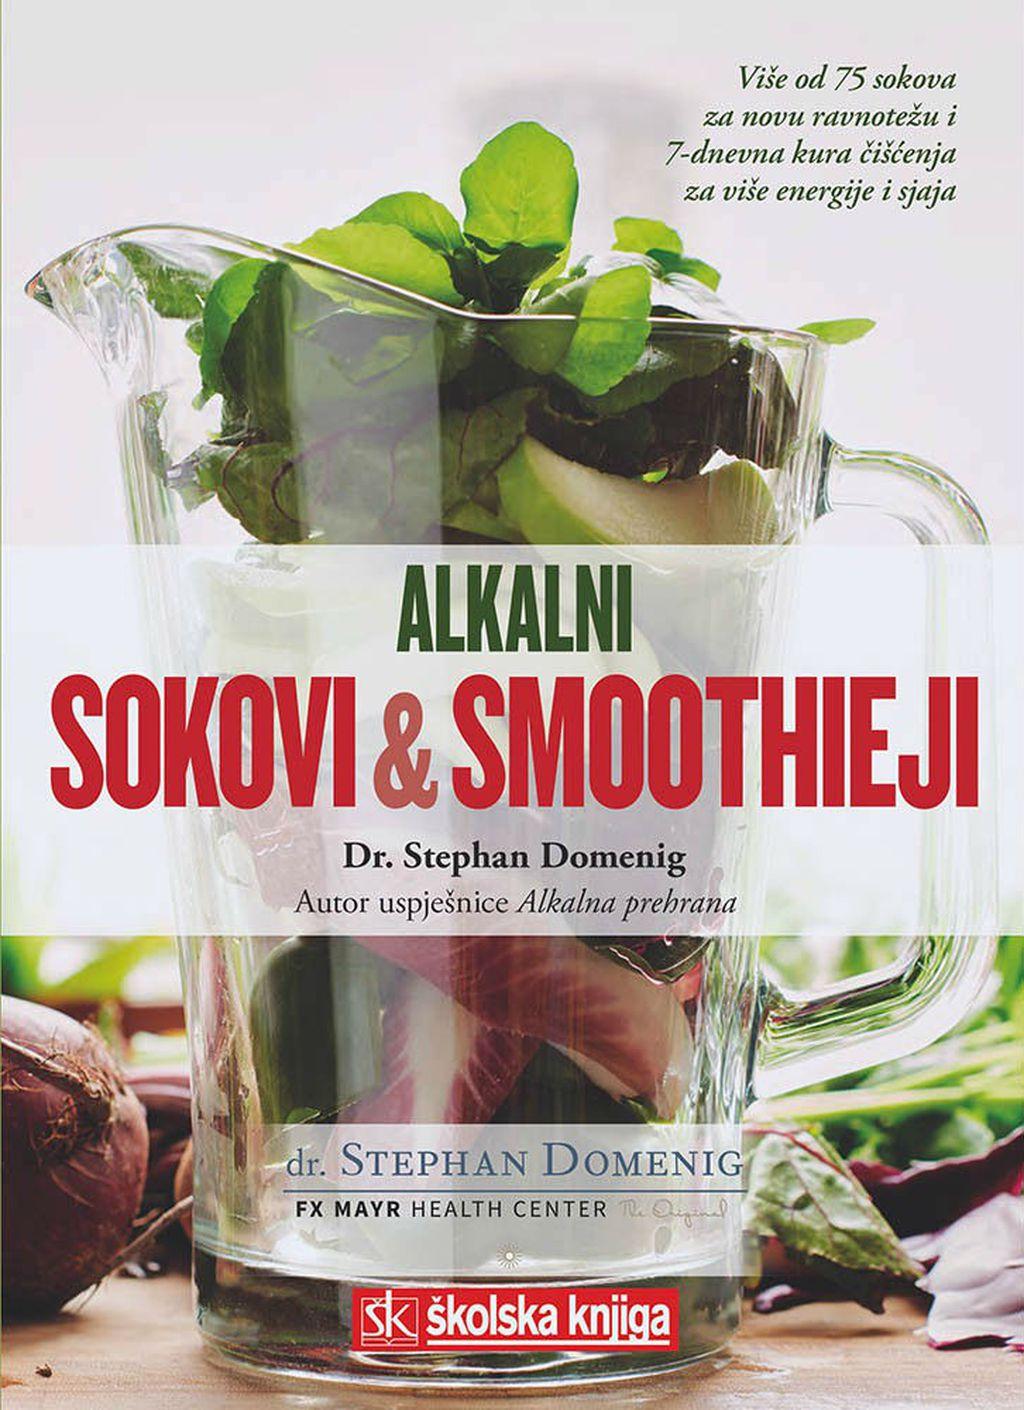 Naslovnica knjige \'Alkalni sokovi & smoothieji\' dr. Stephana Domeniga